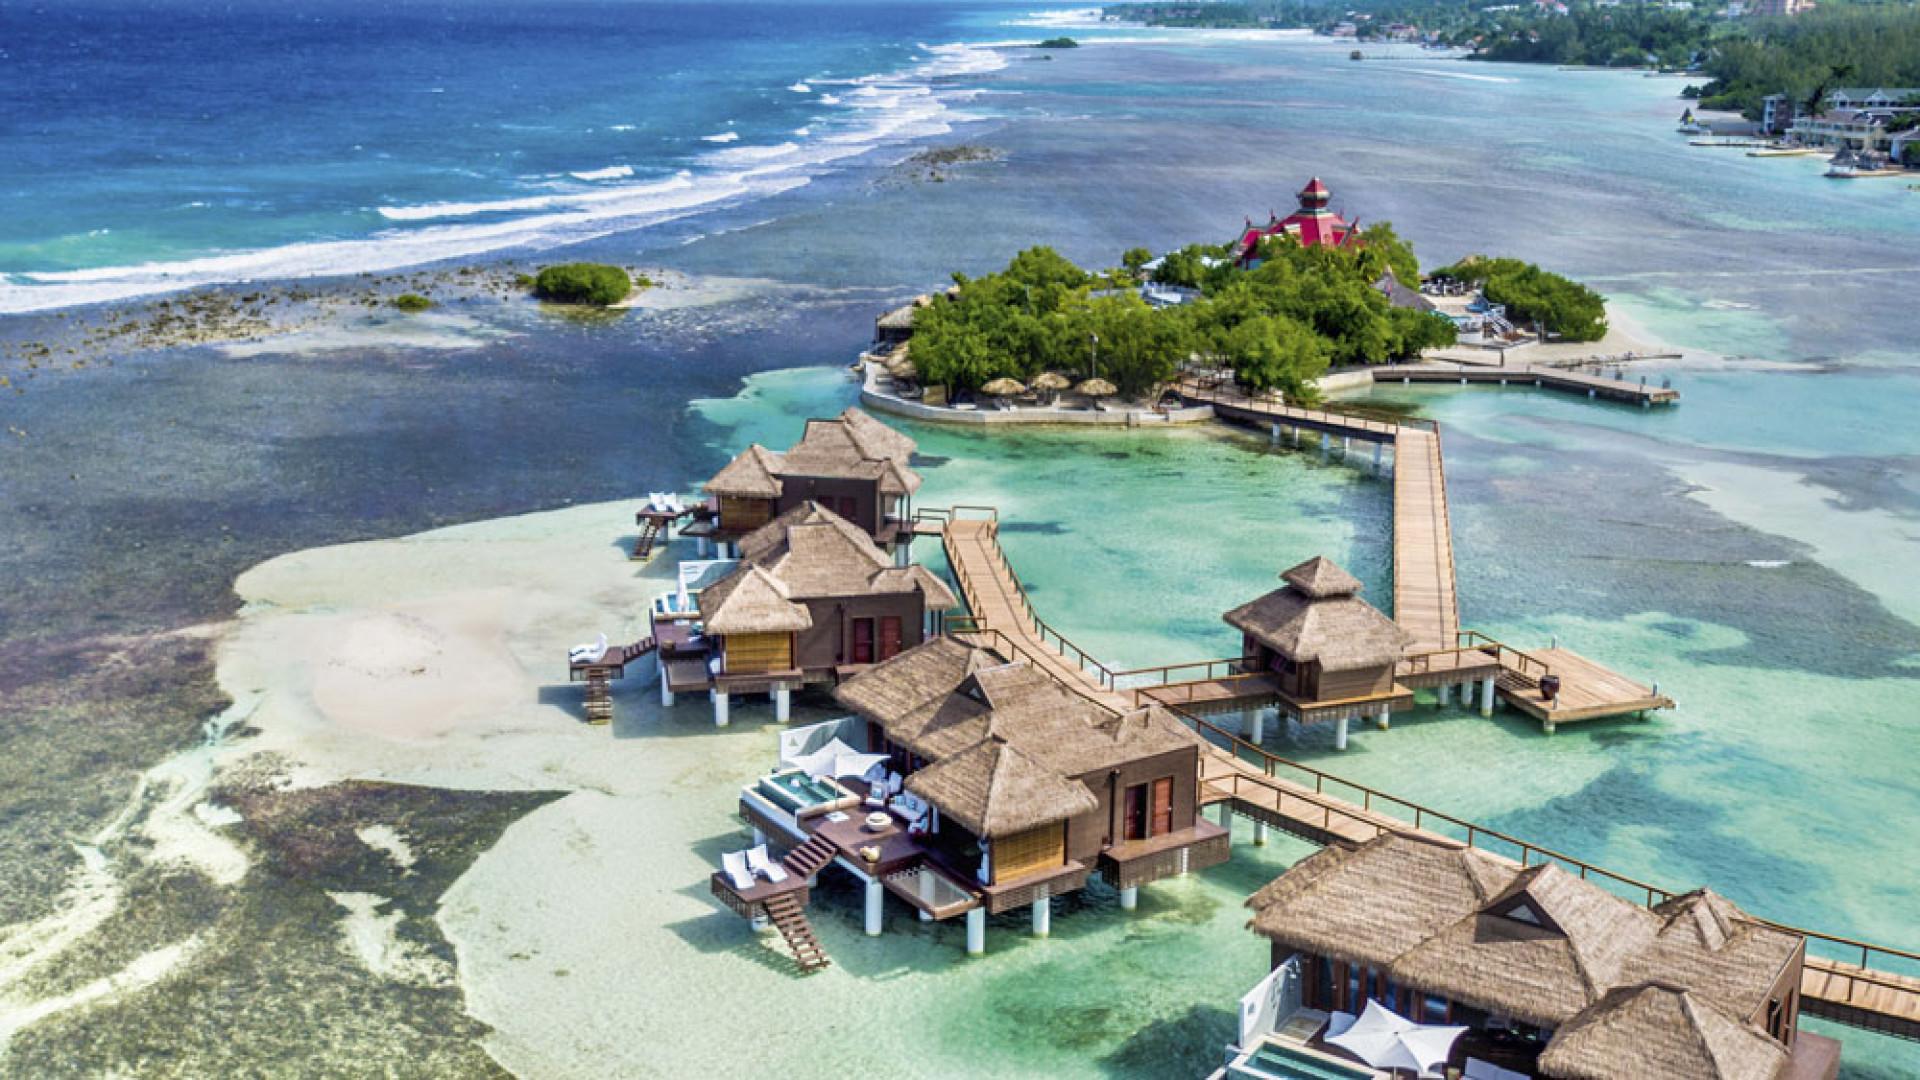 Sandals over-the-water villas at Royal Caribbean Resort, Jamaica